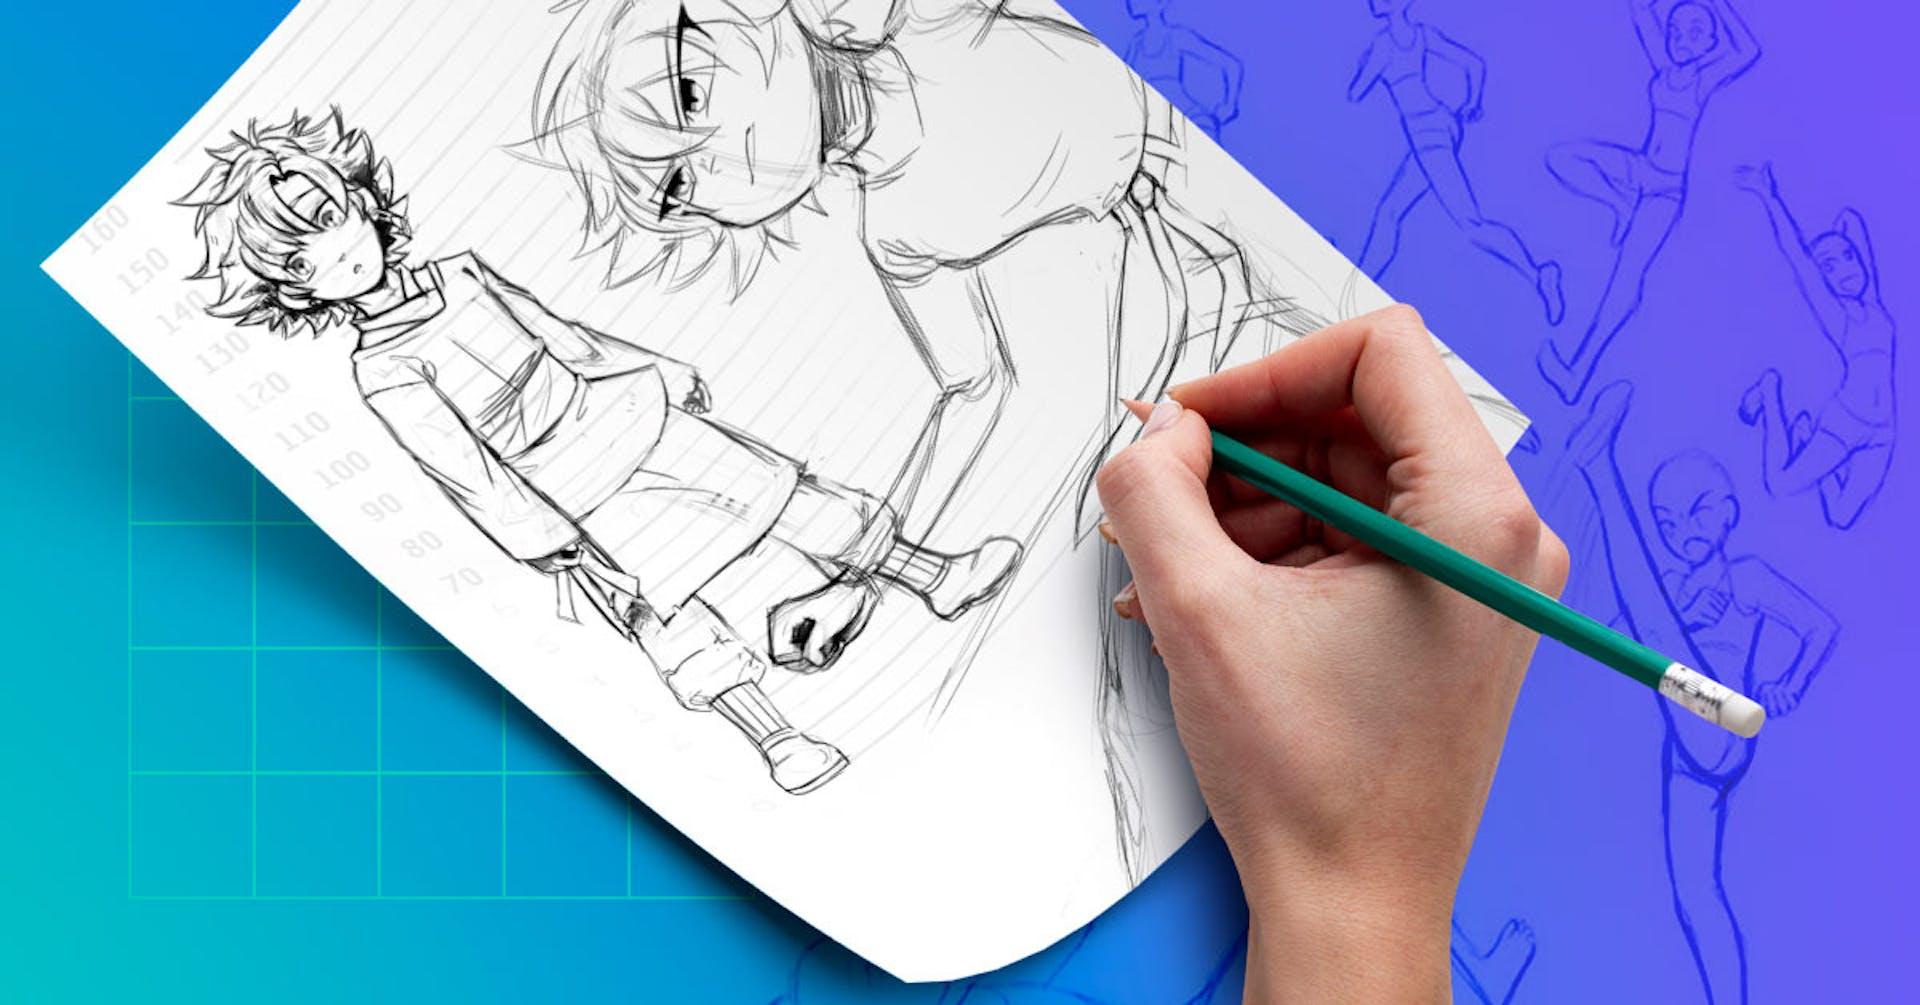 ¿Cómo dibujar poses de anime? Trucos y poses de anime para dibujar